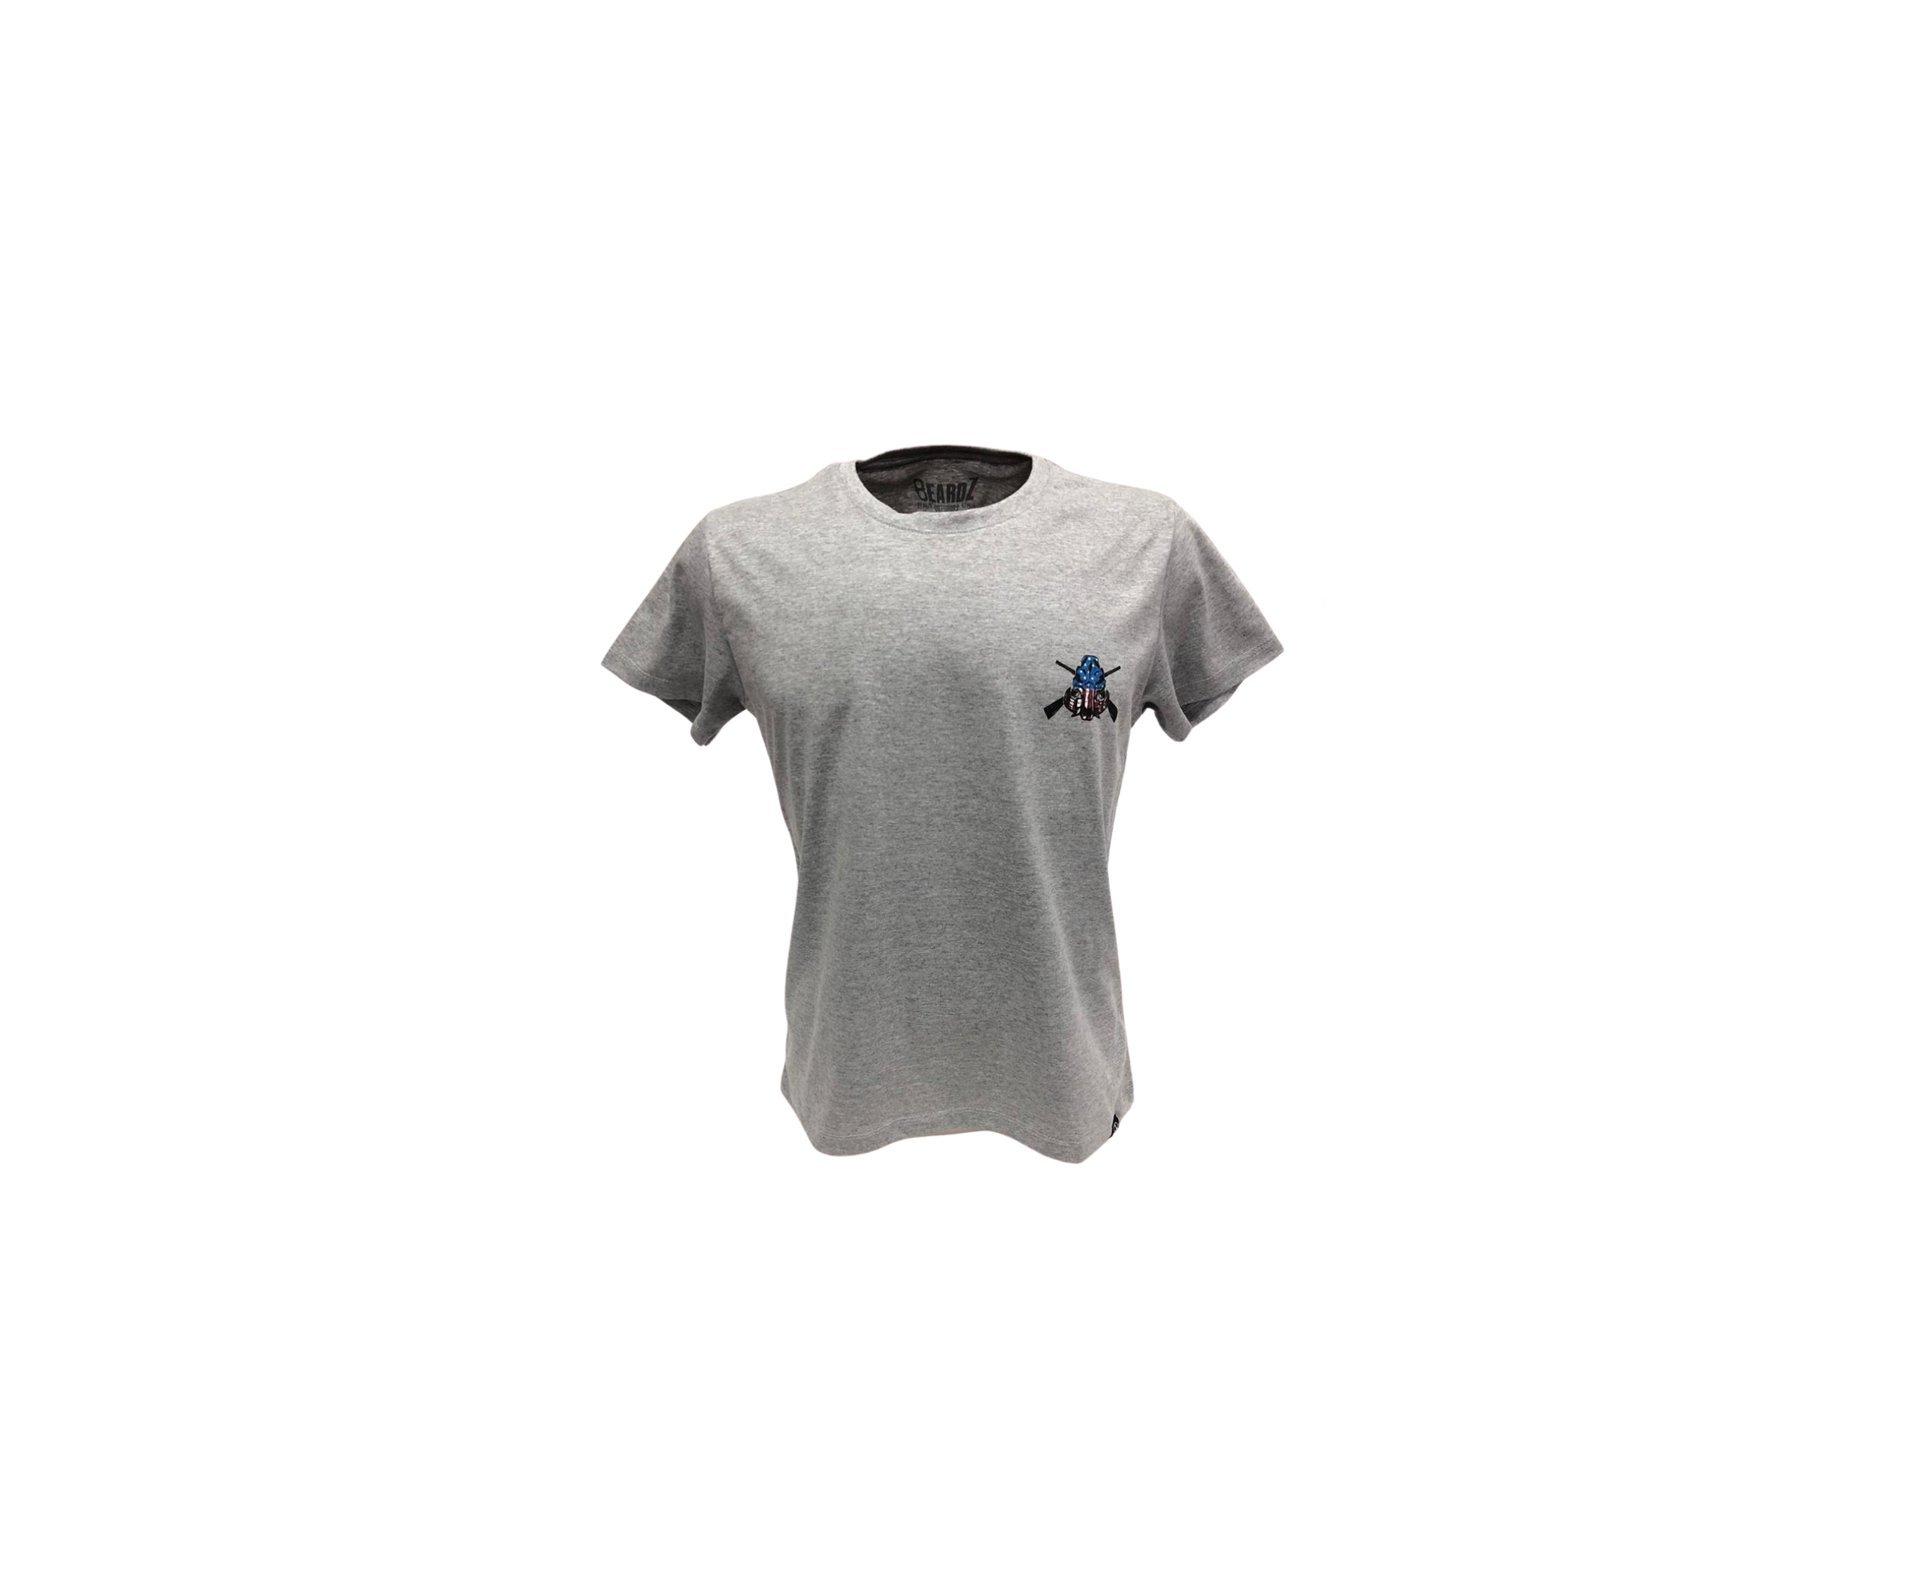 Camiseta Masculina Beardz Honor The Fallen M4 Ts40